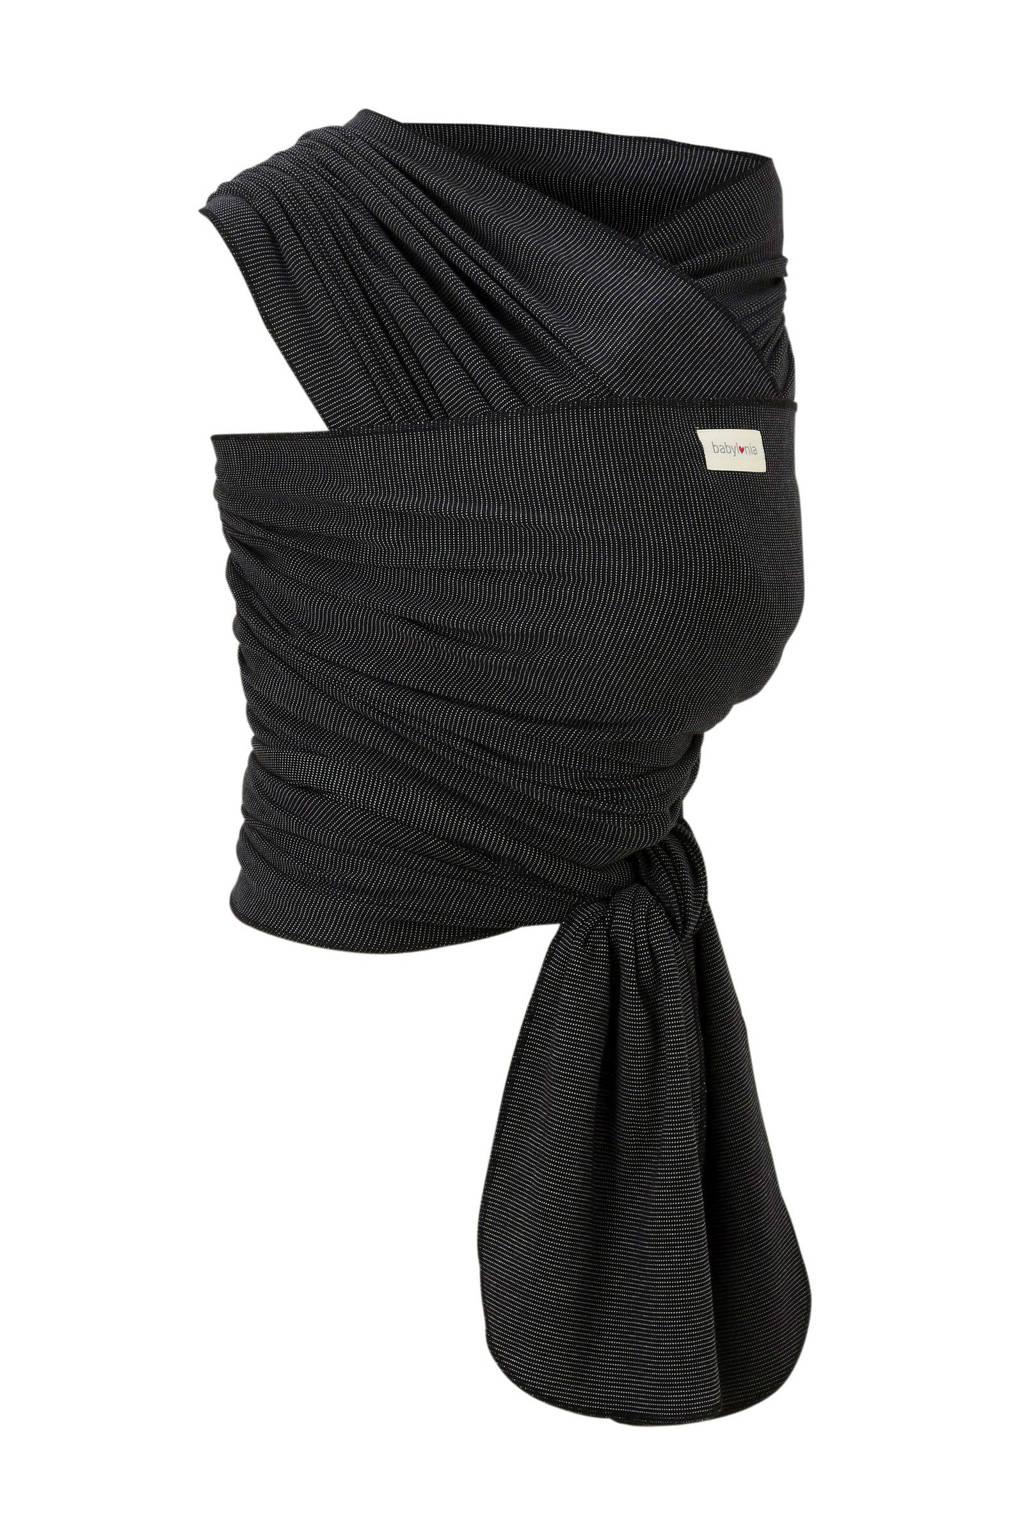 Babylonia draagdoek tricot-slen bamboo zwart, Zwart